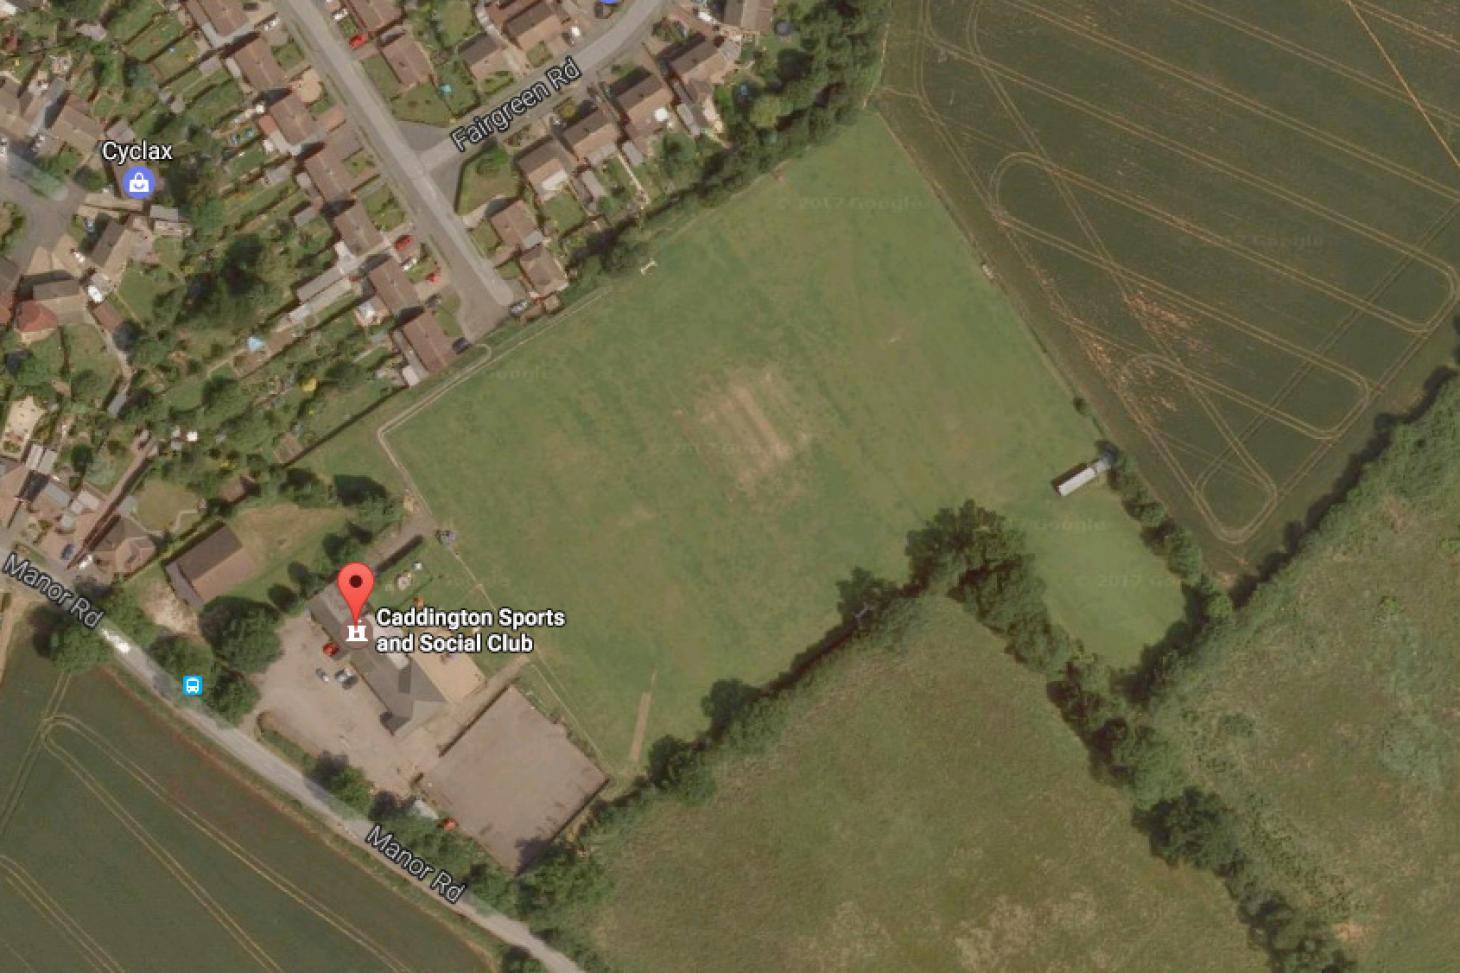 Caddington Sports and Social Club 11 a side | Grass football pitch